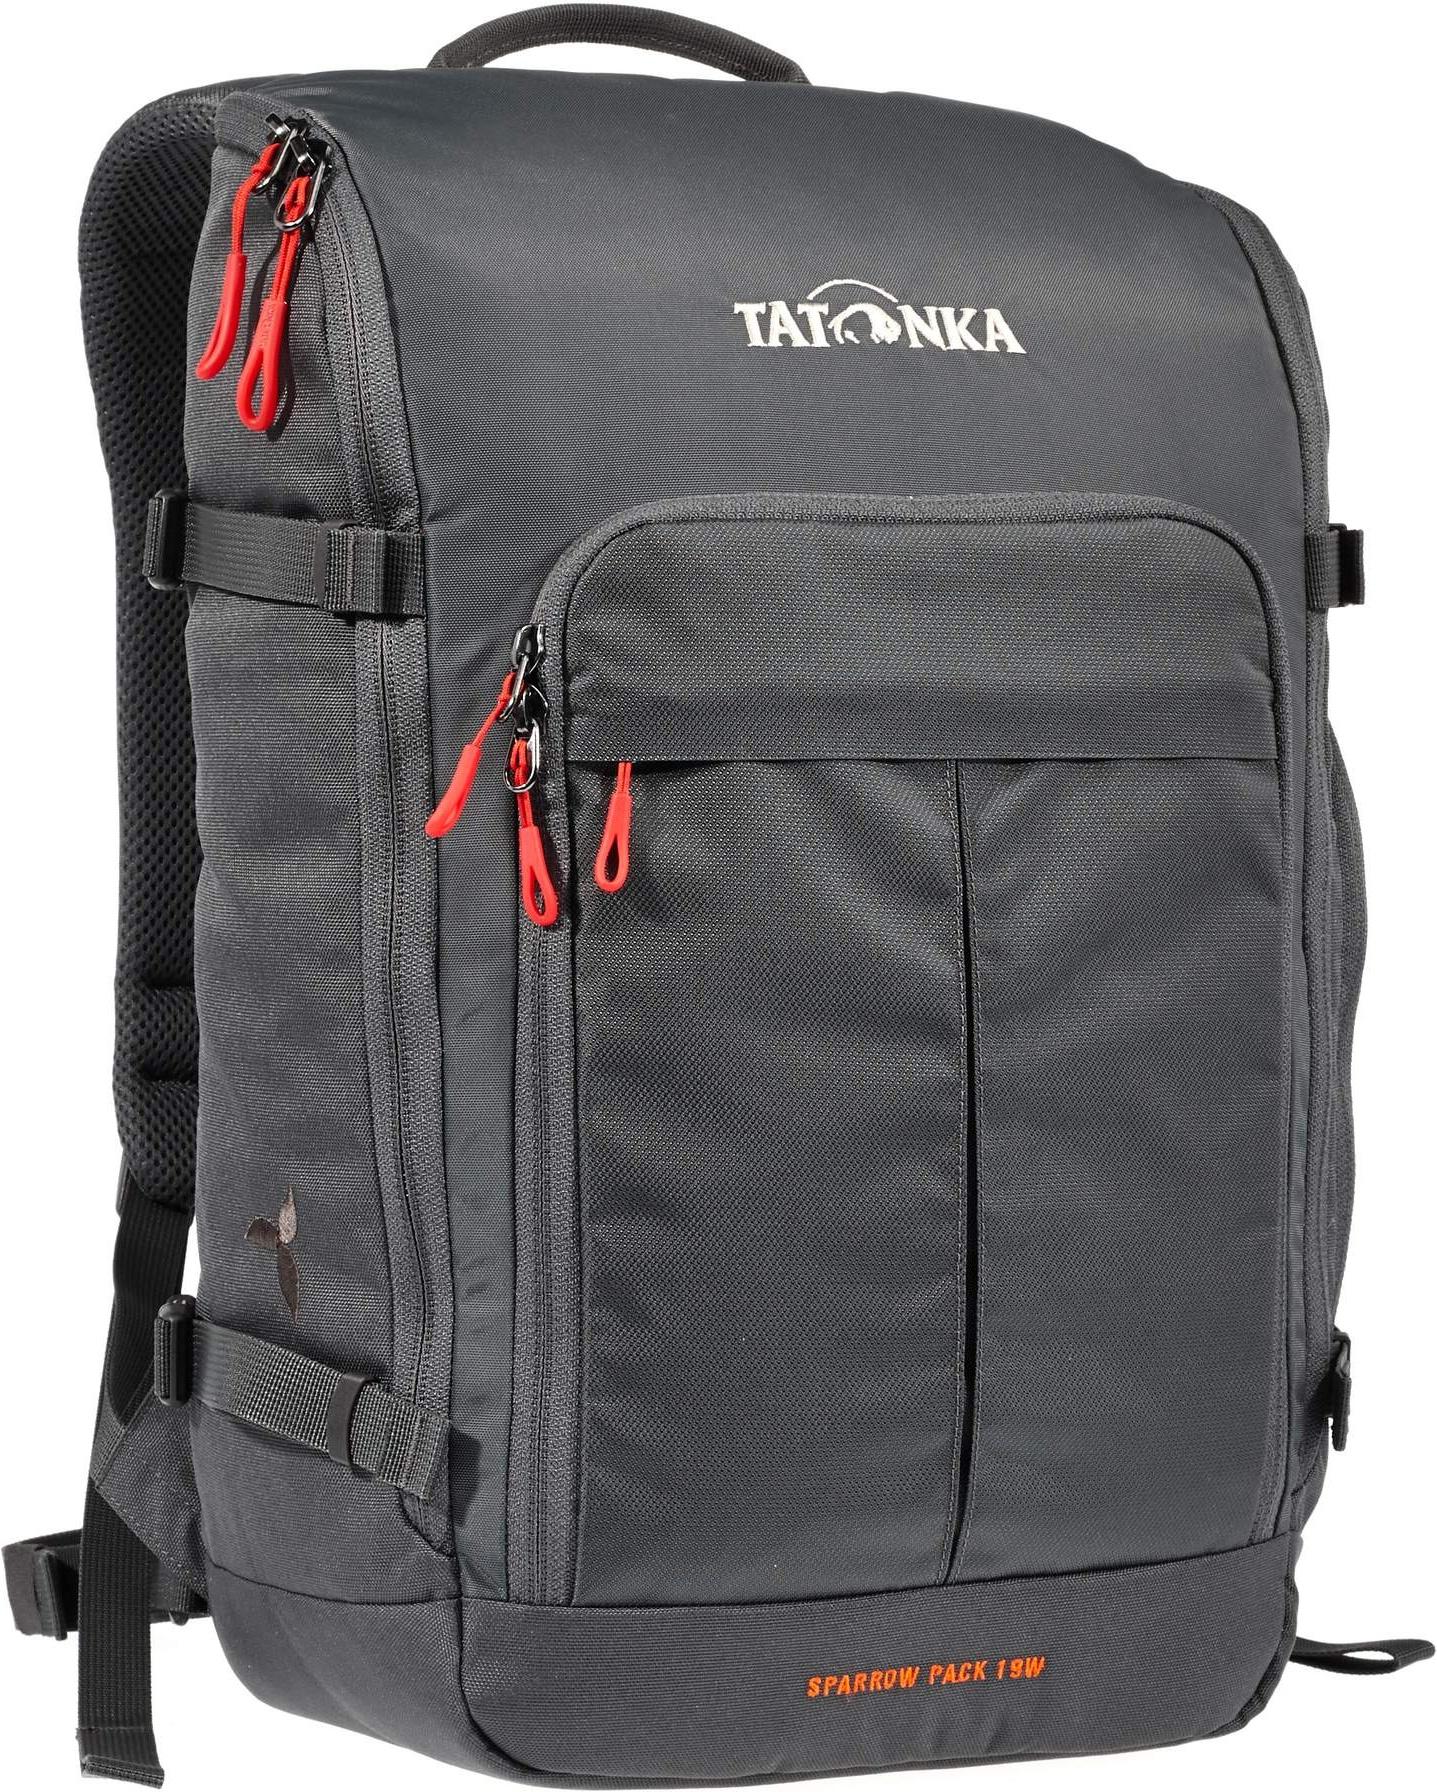 Рюкзак Tatonka Sparrow Pack 19 Women Titan Grey